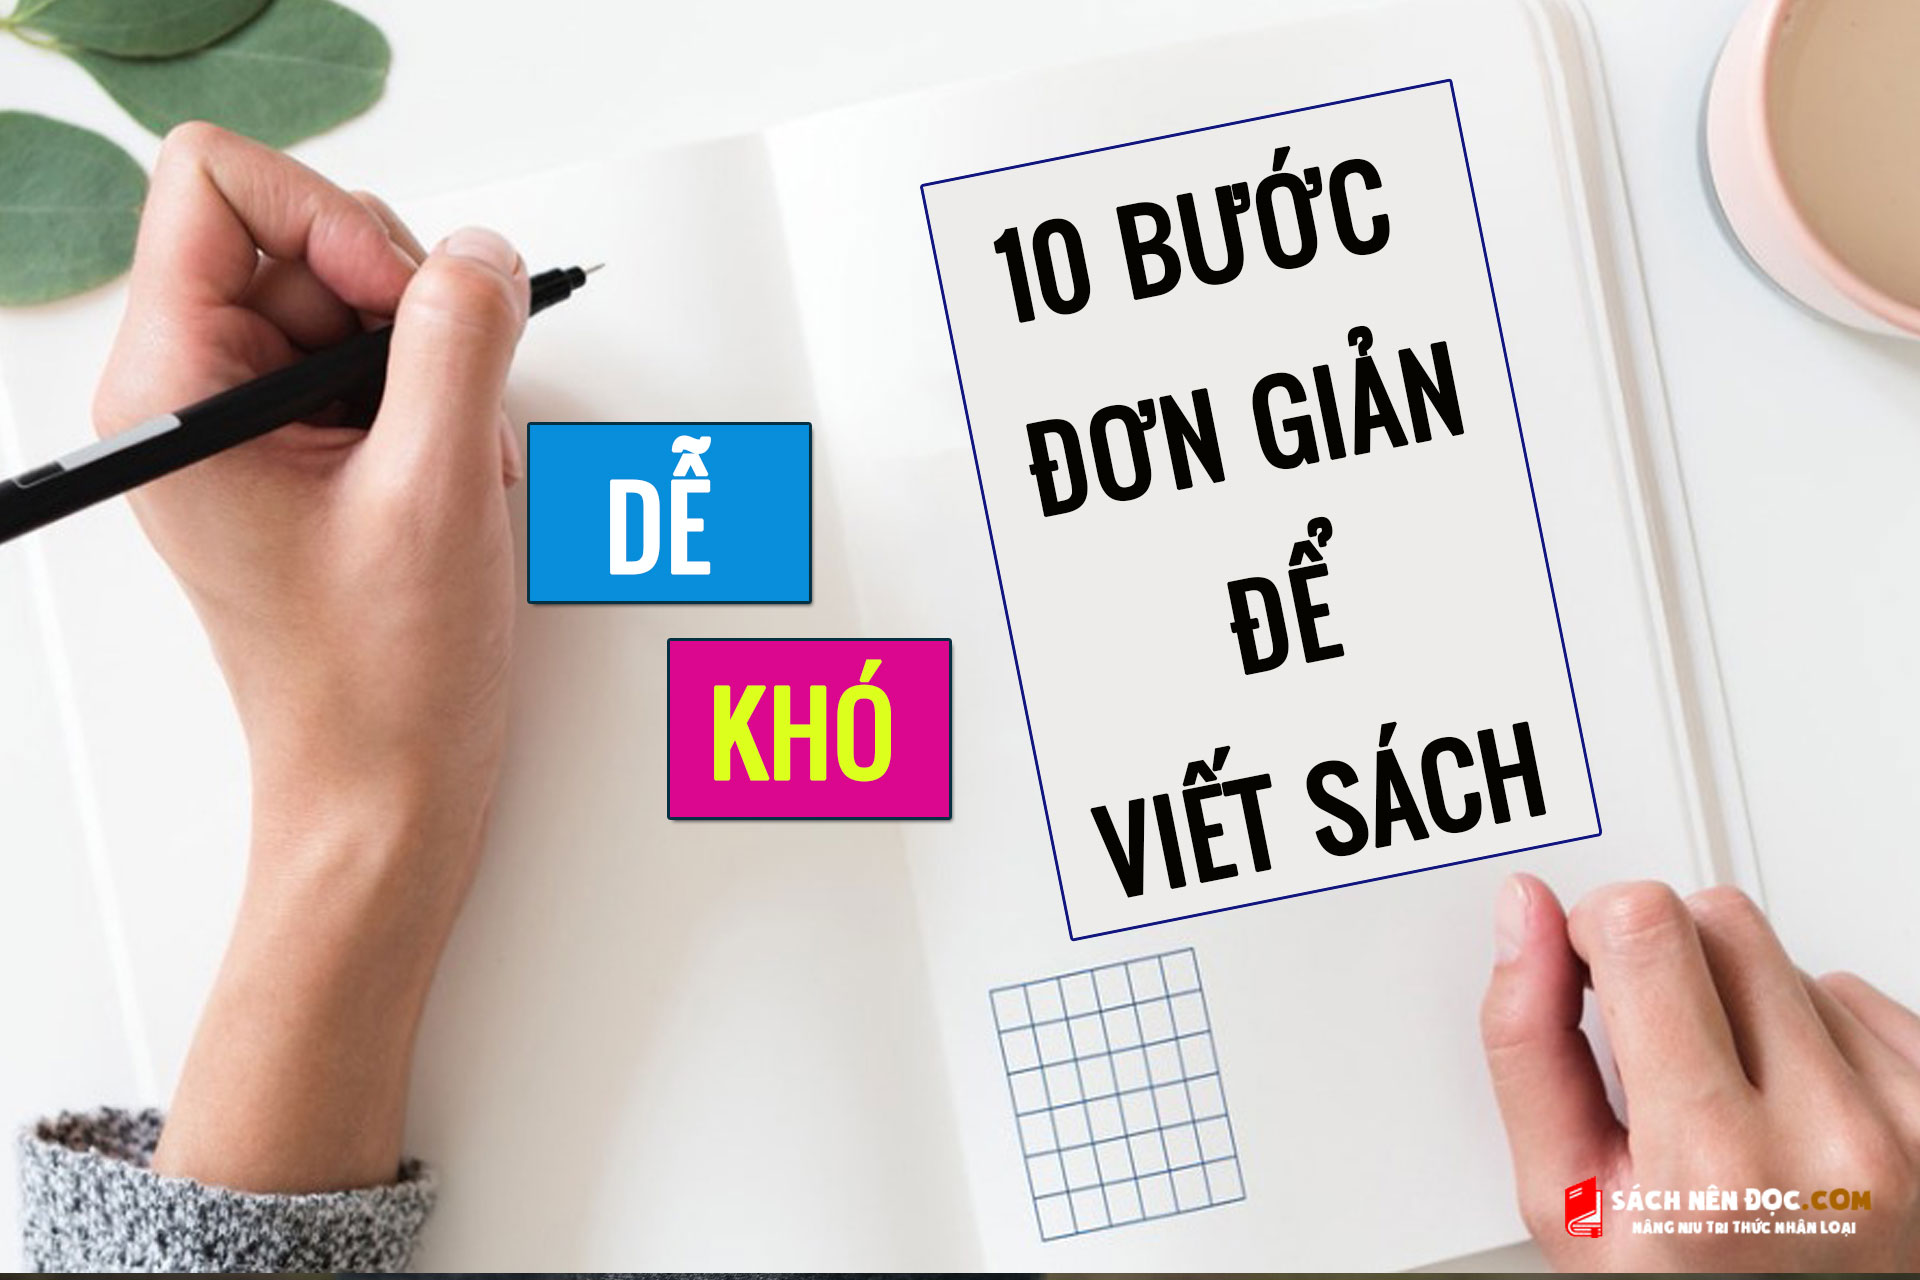 10-buoc-dan-gian-viet-mot-cuon-sach